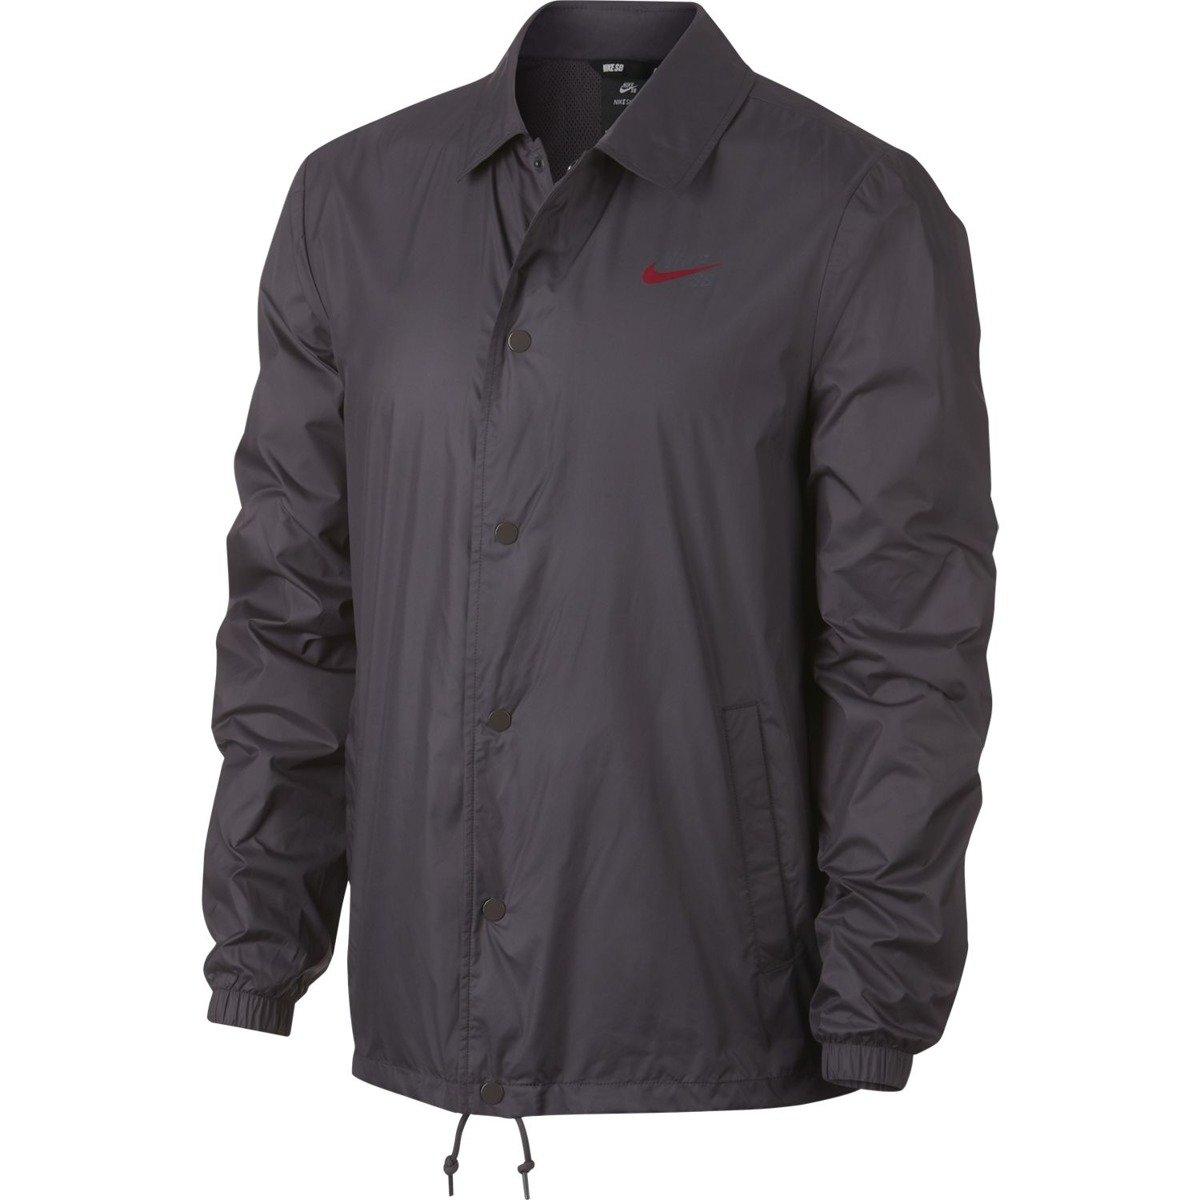 c17c0a8d Nike Sb Shield Thunder Grey/team Crimson grey | Clothes \ Jackets Brands \ Nike  SB | Skateshop Miniramp.pl